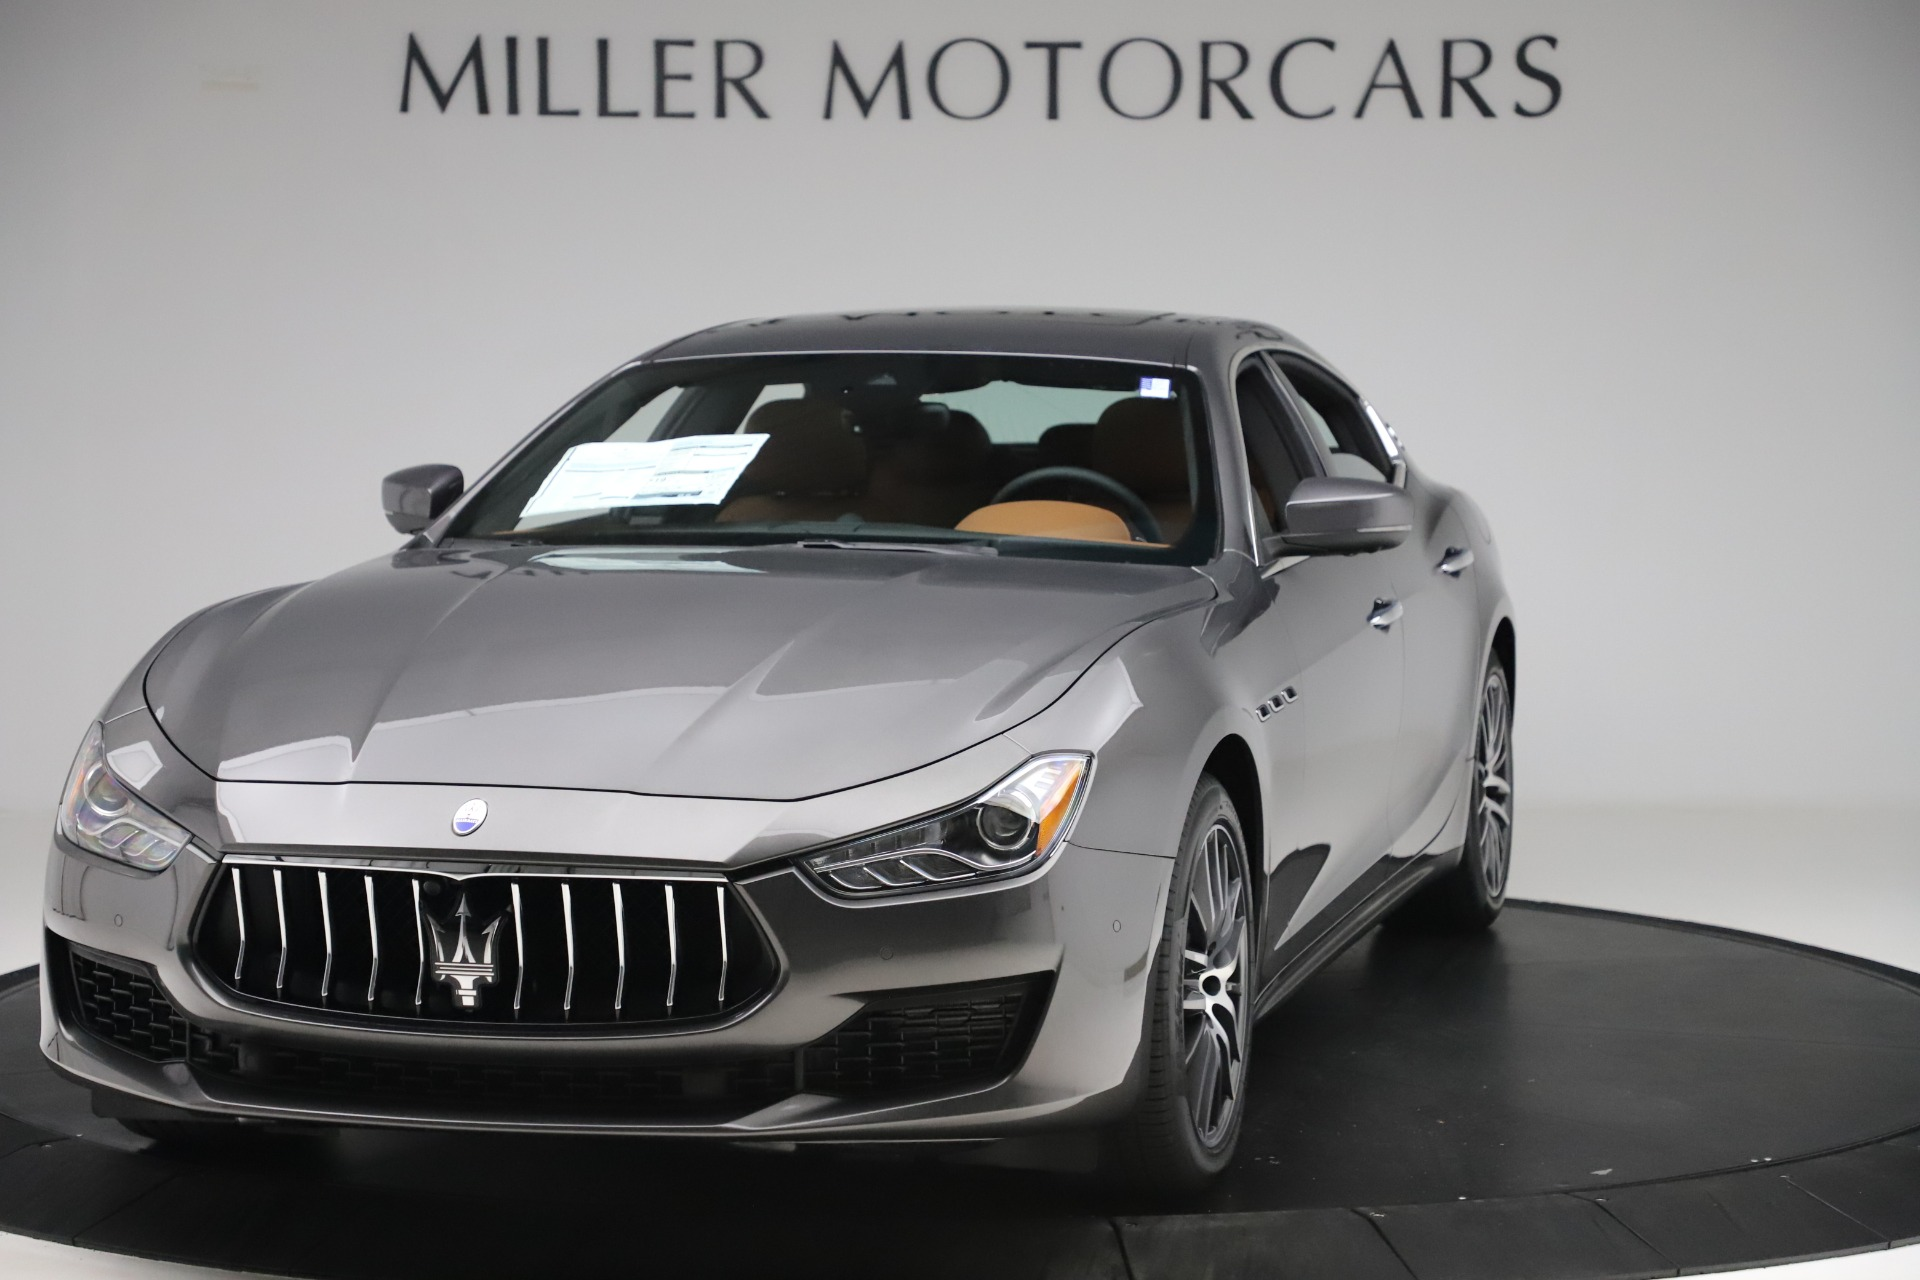 New 2020 Maserati Ghibli S Q4 for sale Sold at McLaren Greenwich in Greenwich CT 06830 1